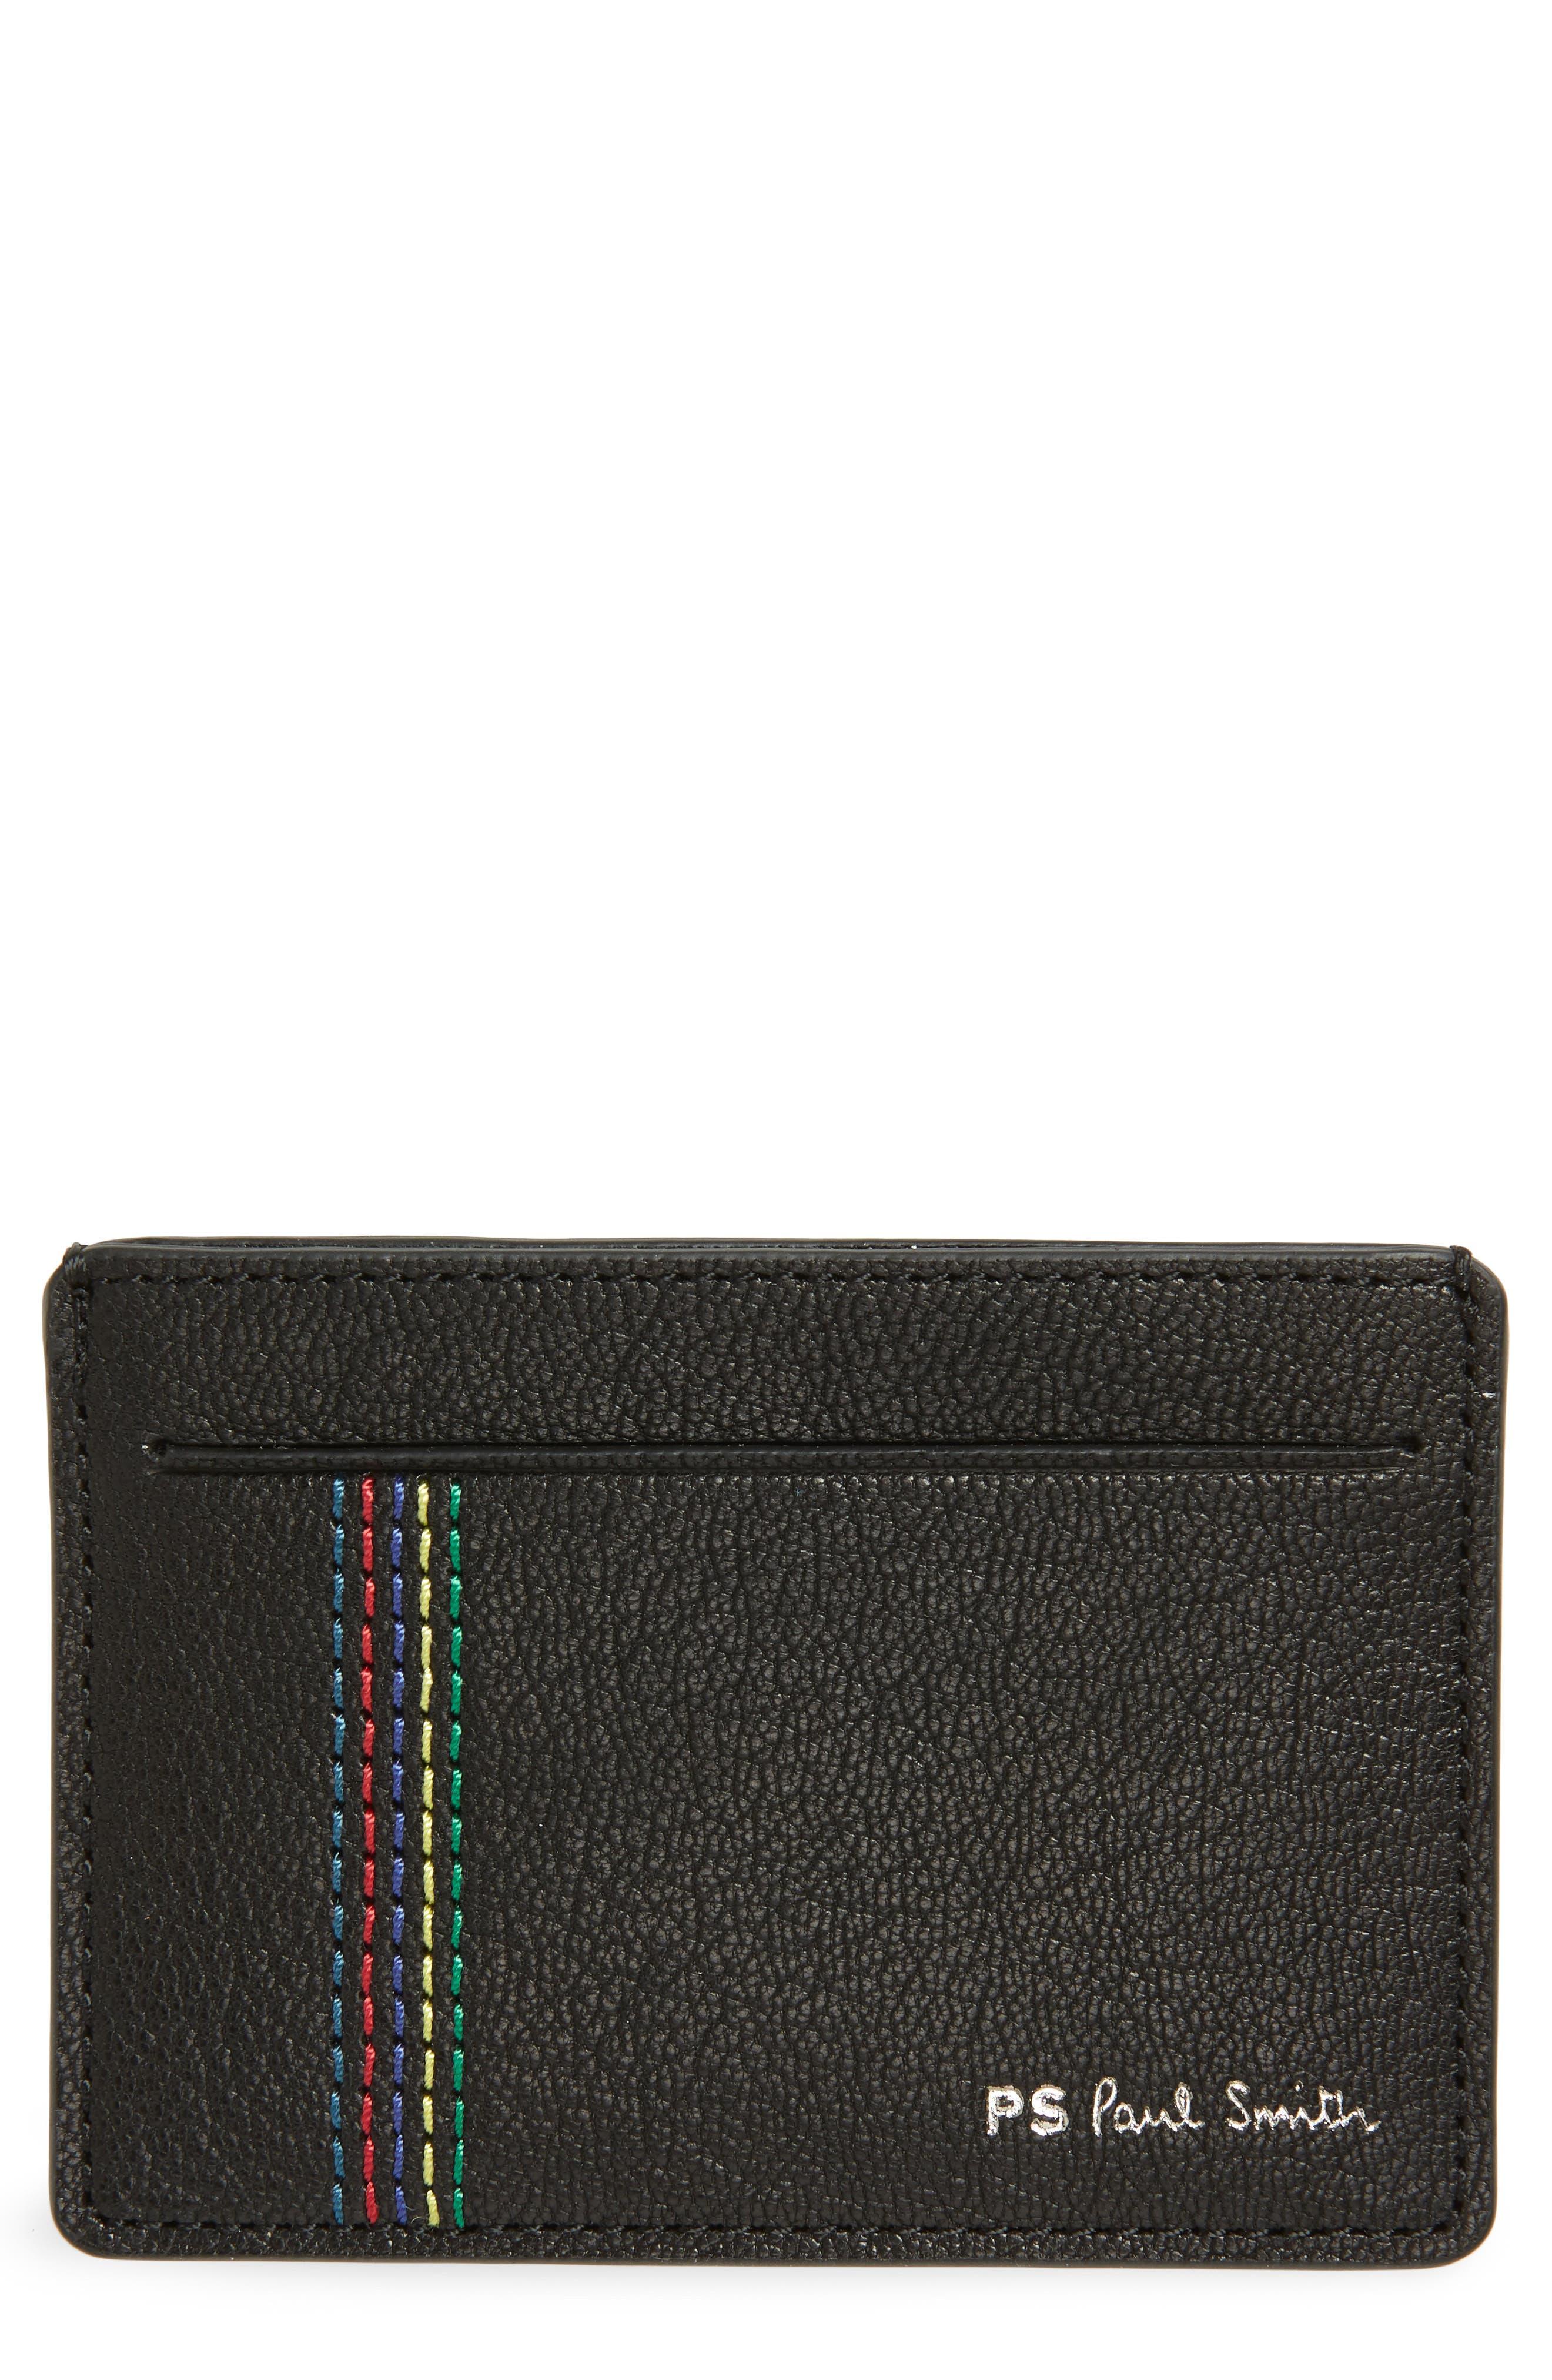 PAUL SMITH Leather Card Case, Main, color, 001